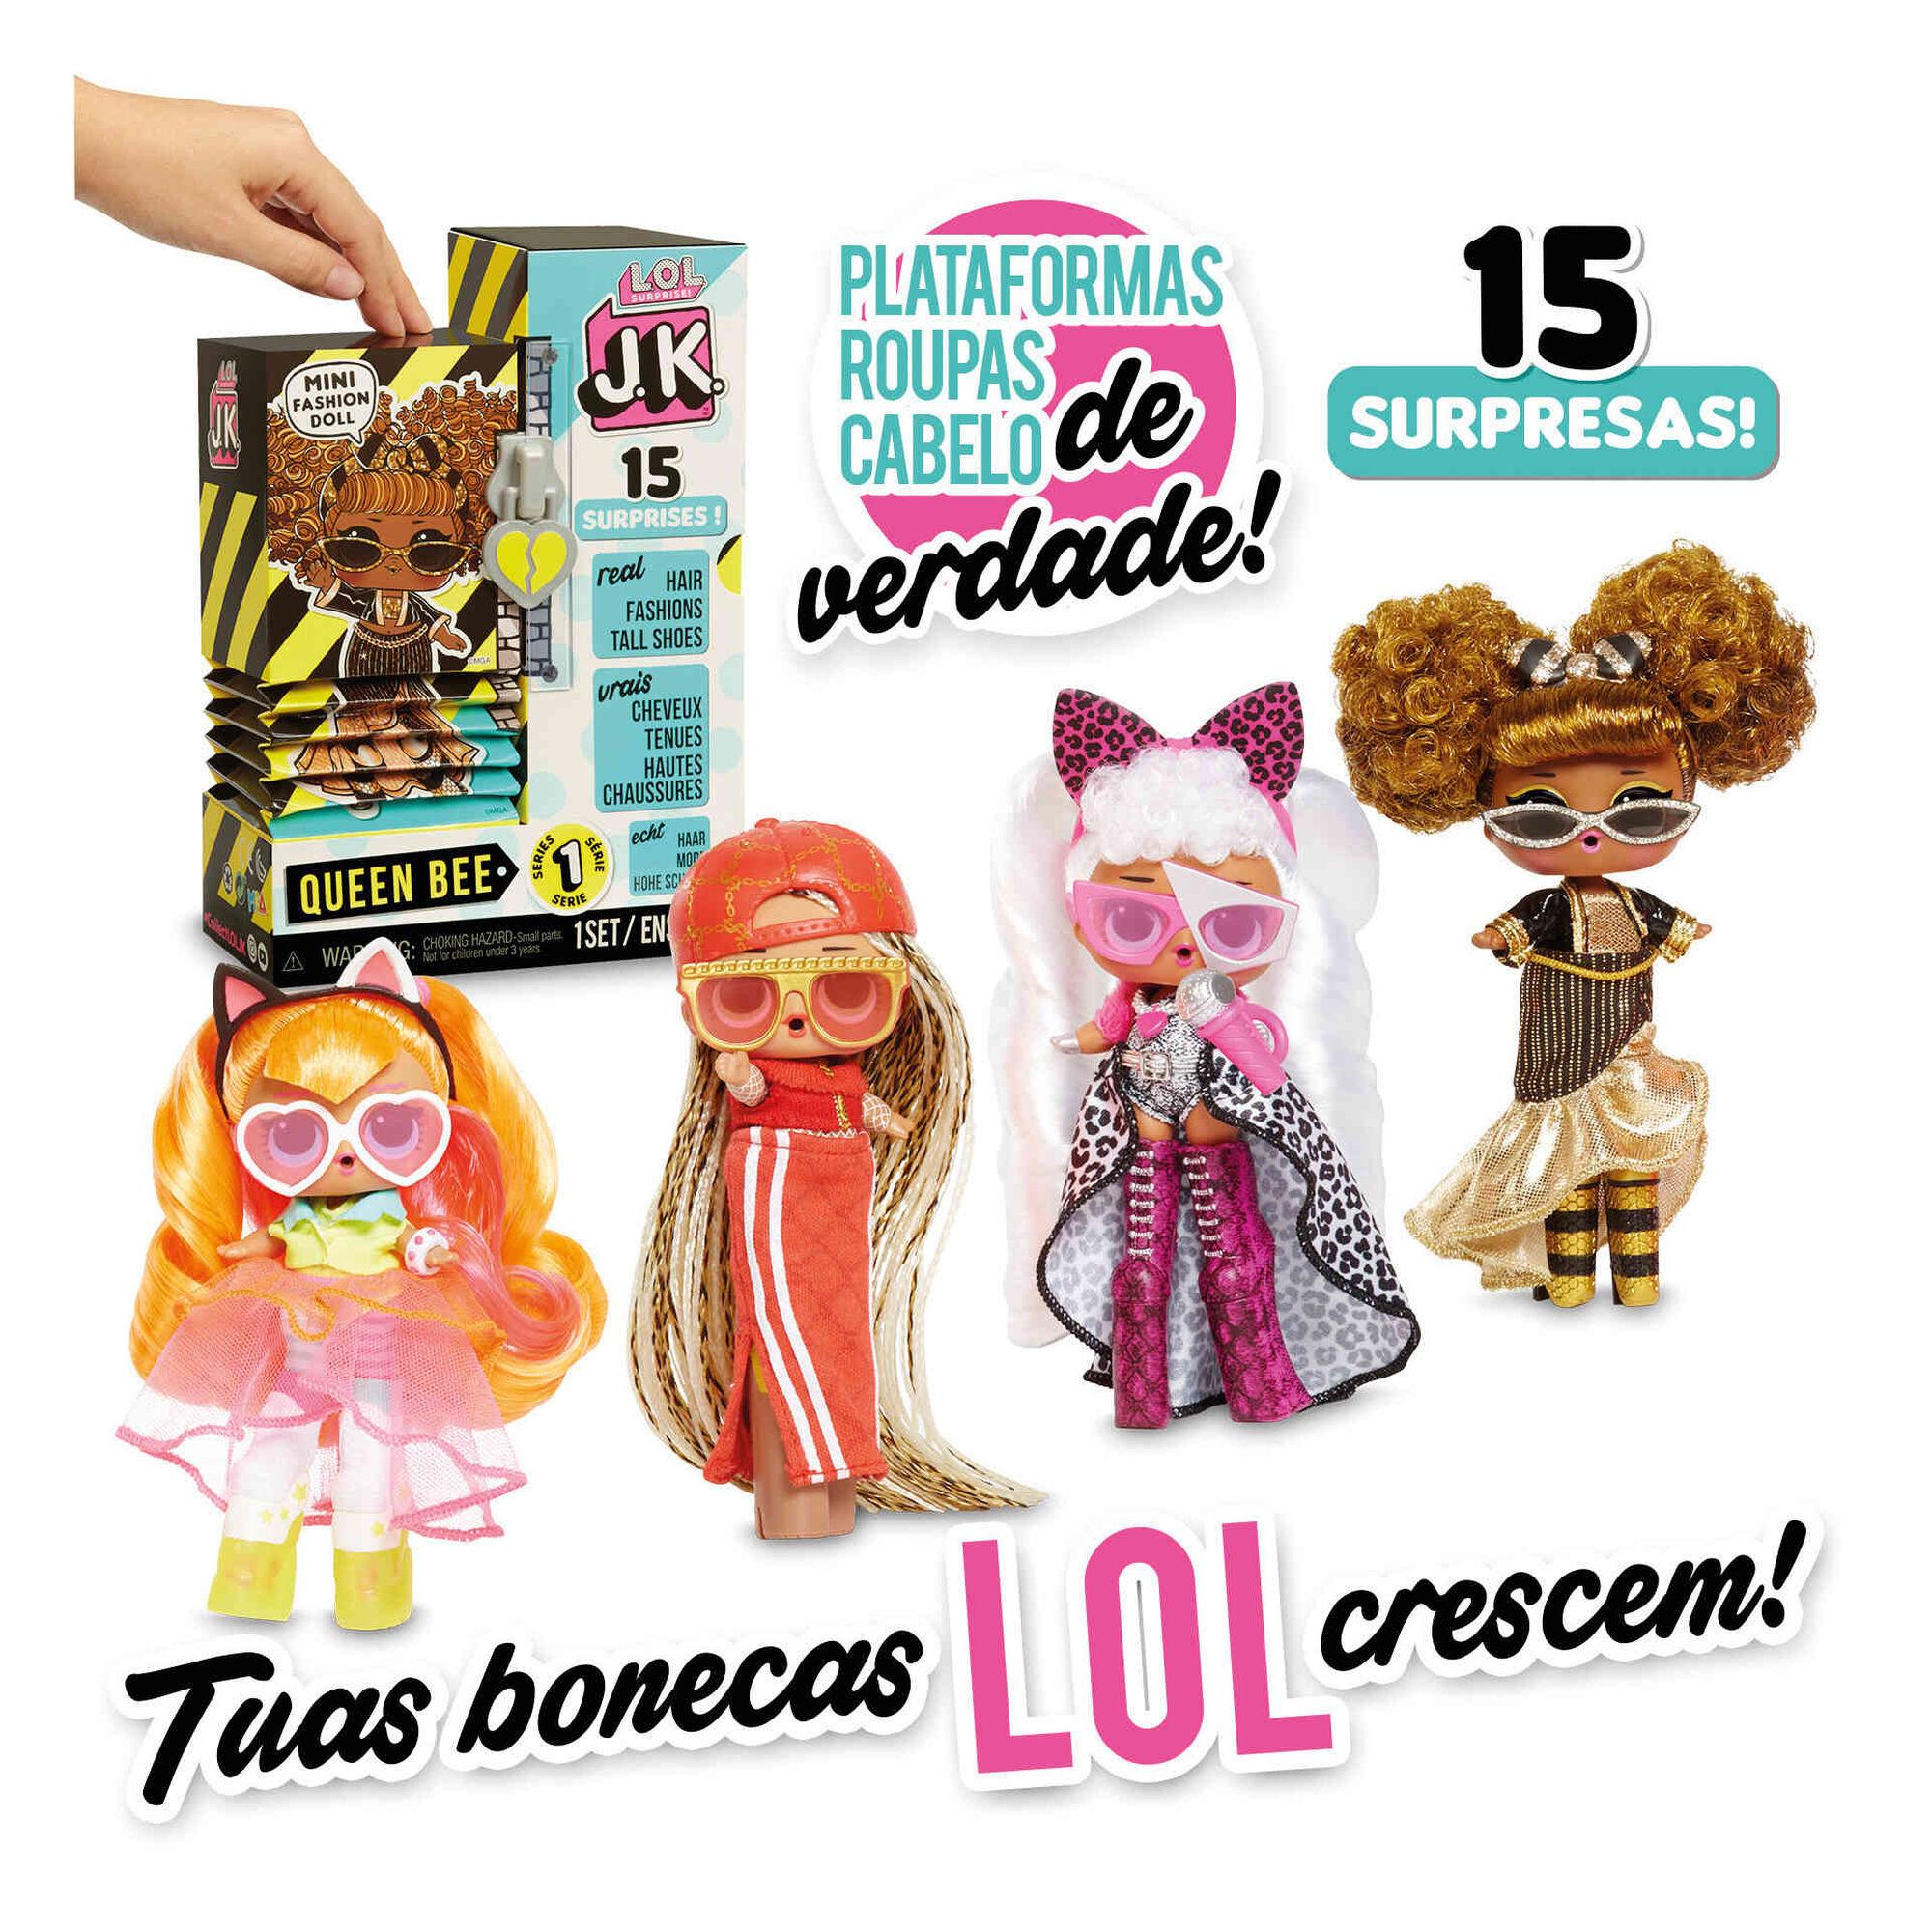 Boneca L.O.L. Surprise! Fashion J.K. (vários modelos)